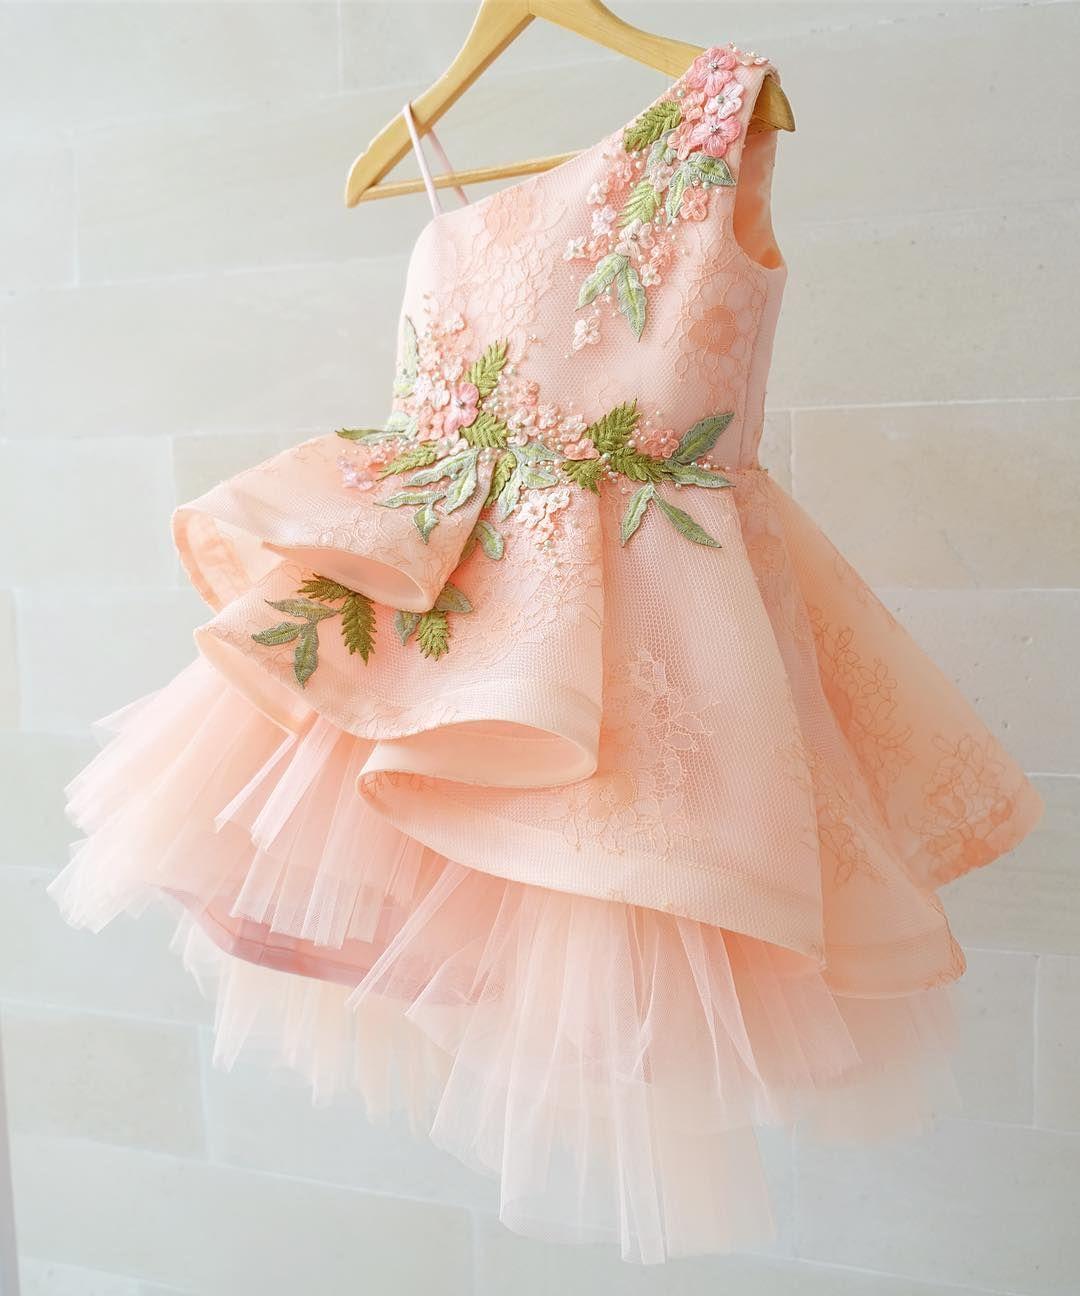 4aaea60a0 ---Jane dress---  welovesdetails  thankyoufortrusting  honeybee kids   honeybeekids